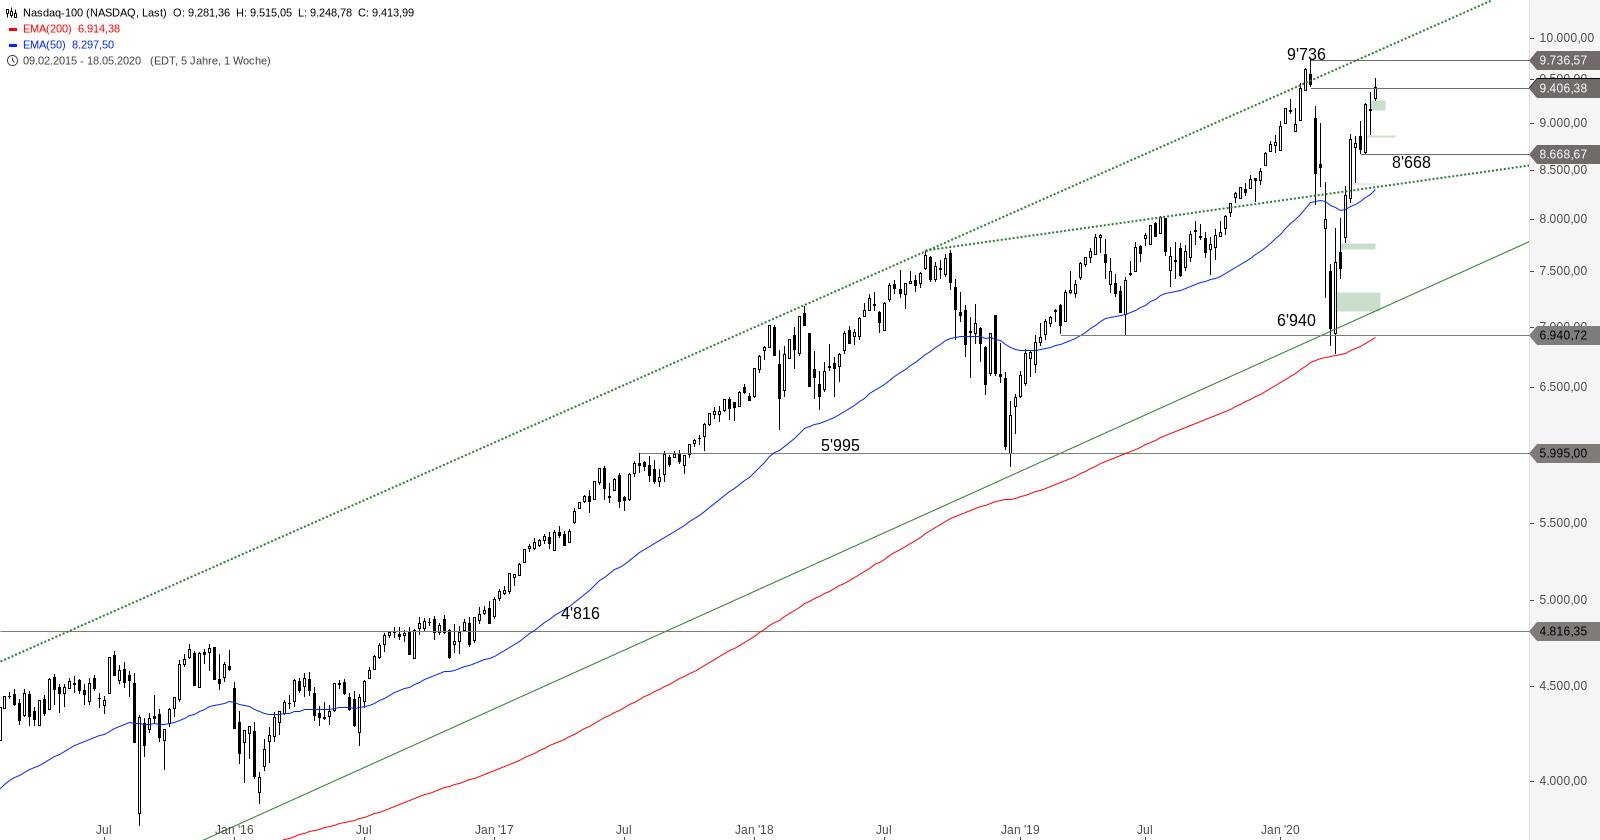 NASDAQ-100-Prominente-Hürde-naht-Chartanalyse-Alexander-Paulus-GodmodeTrader.de-2